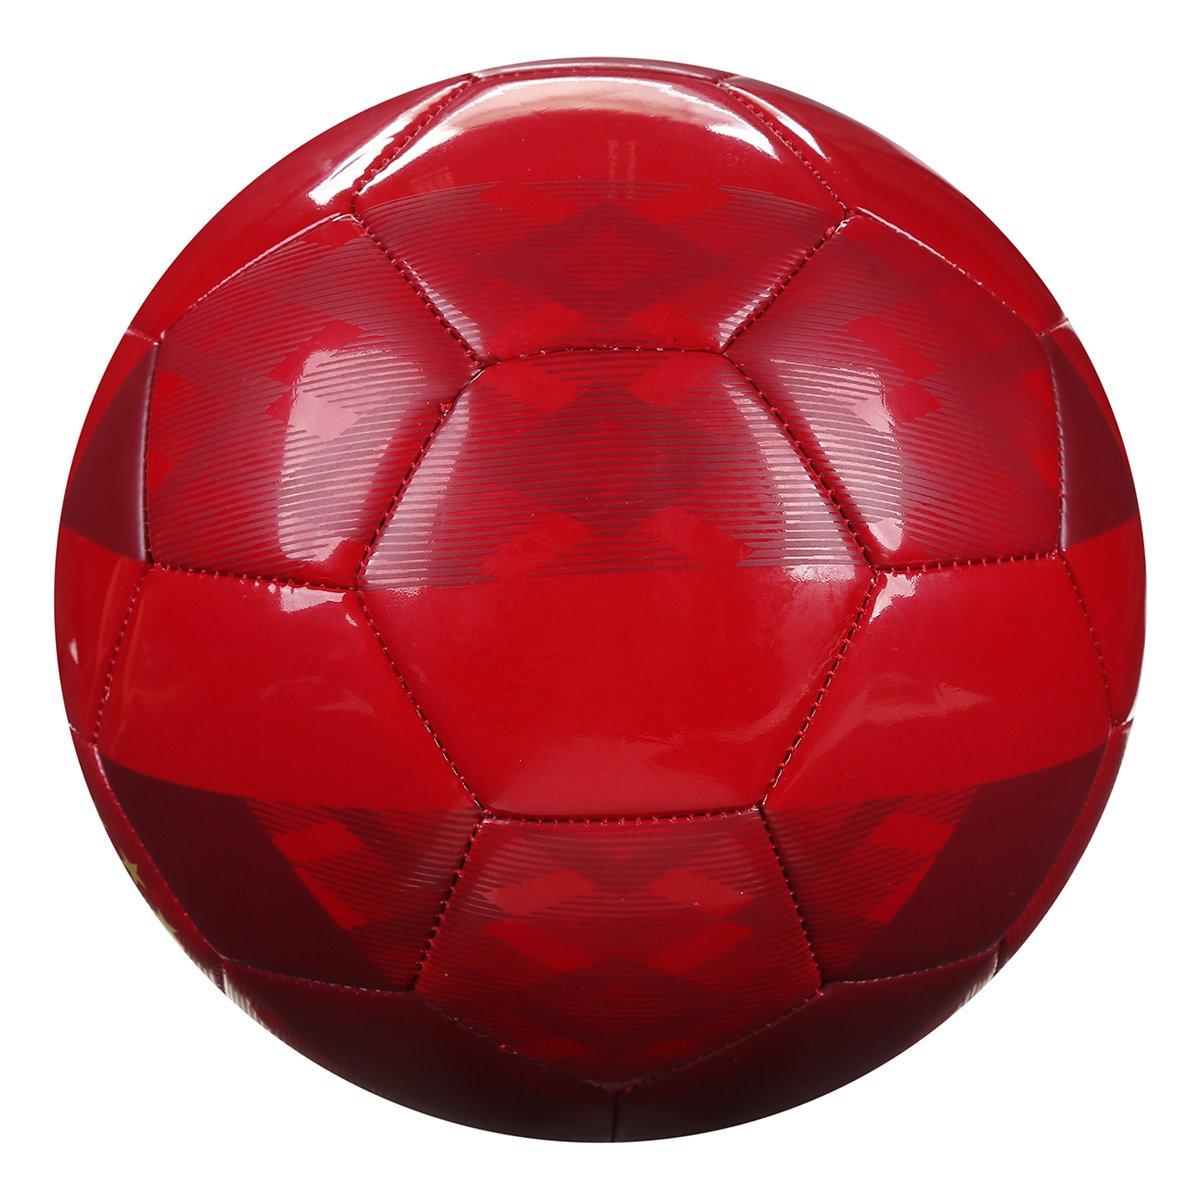 Bola de Futebol Campo Adidas Bayern de Munique - Compre Agora ... ee69c98bc7329